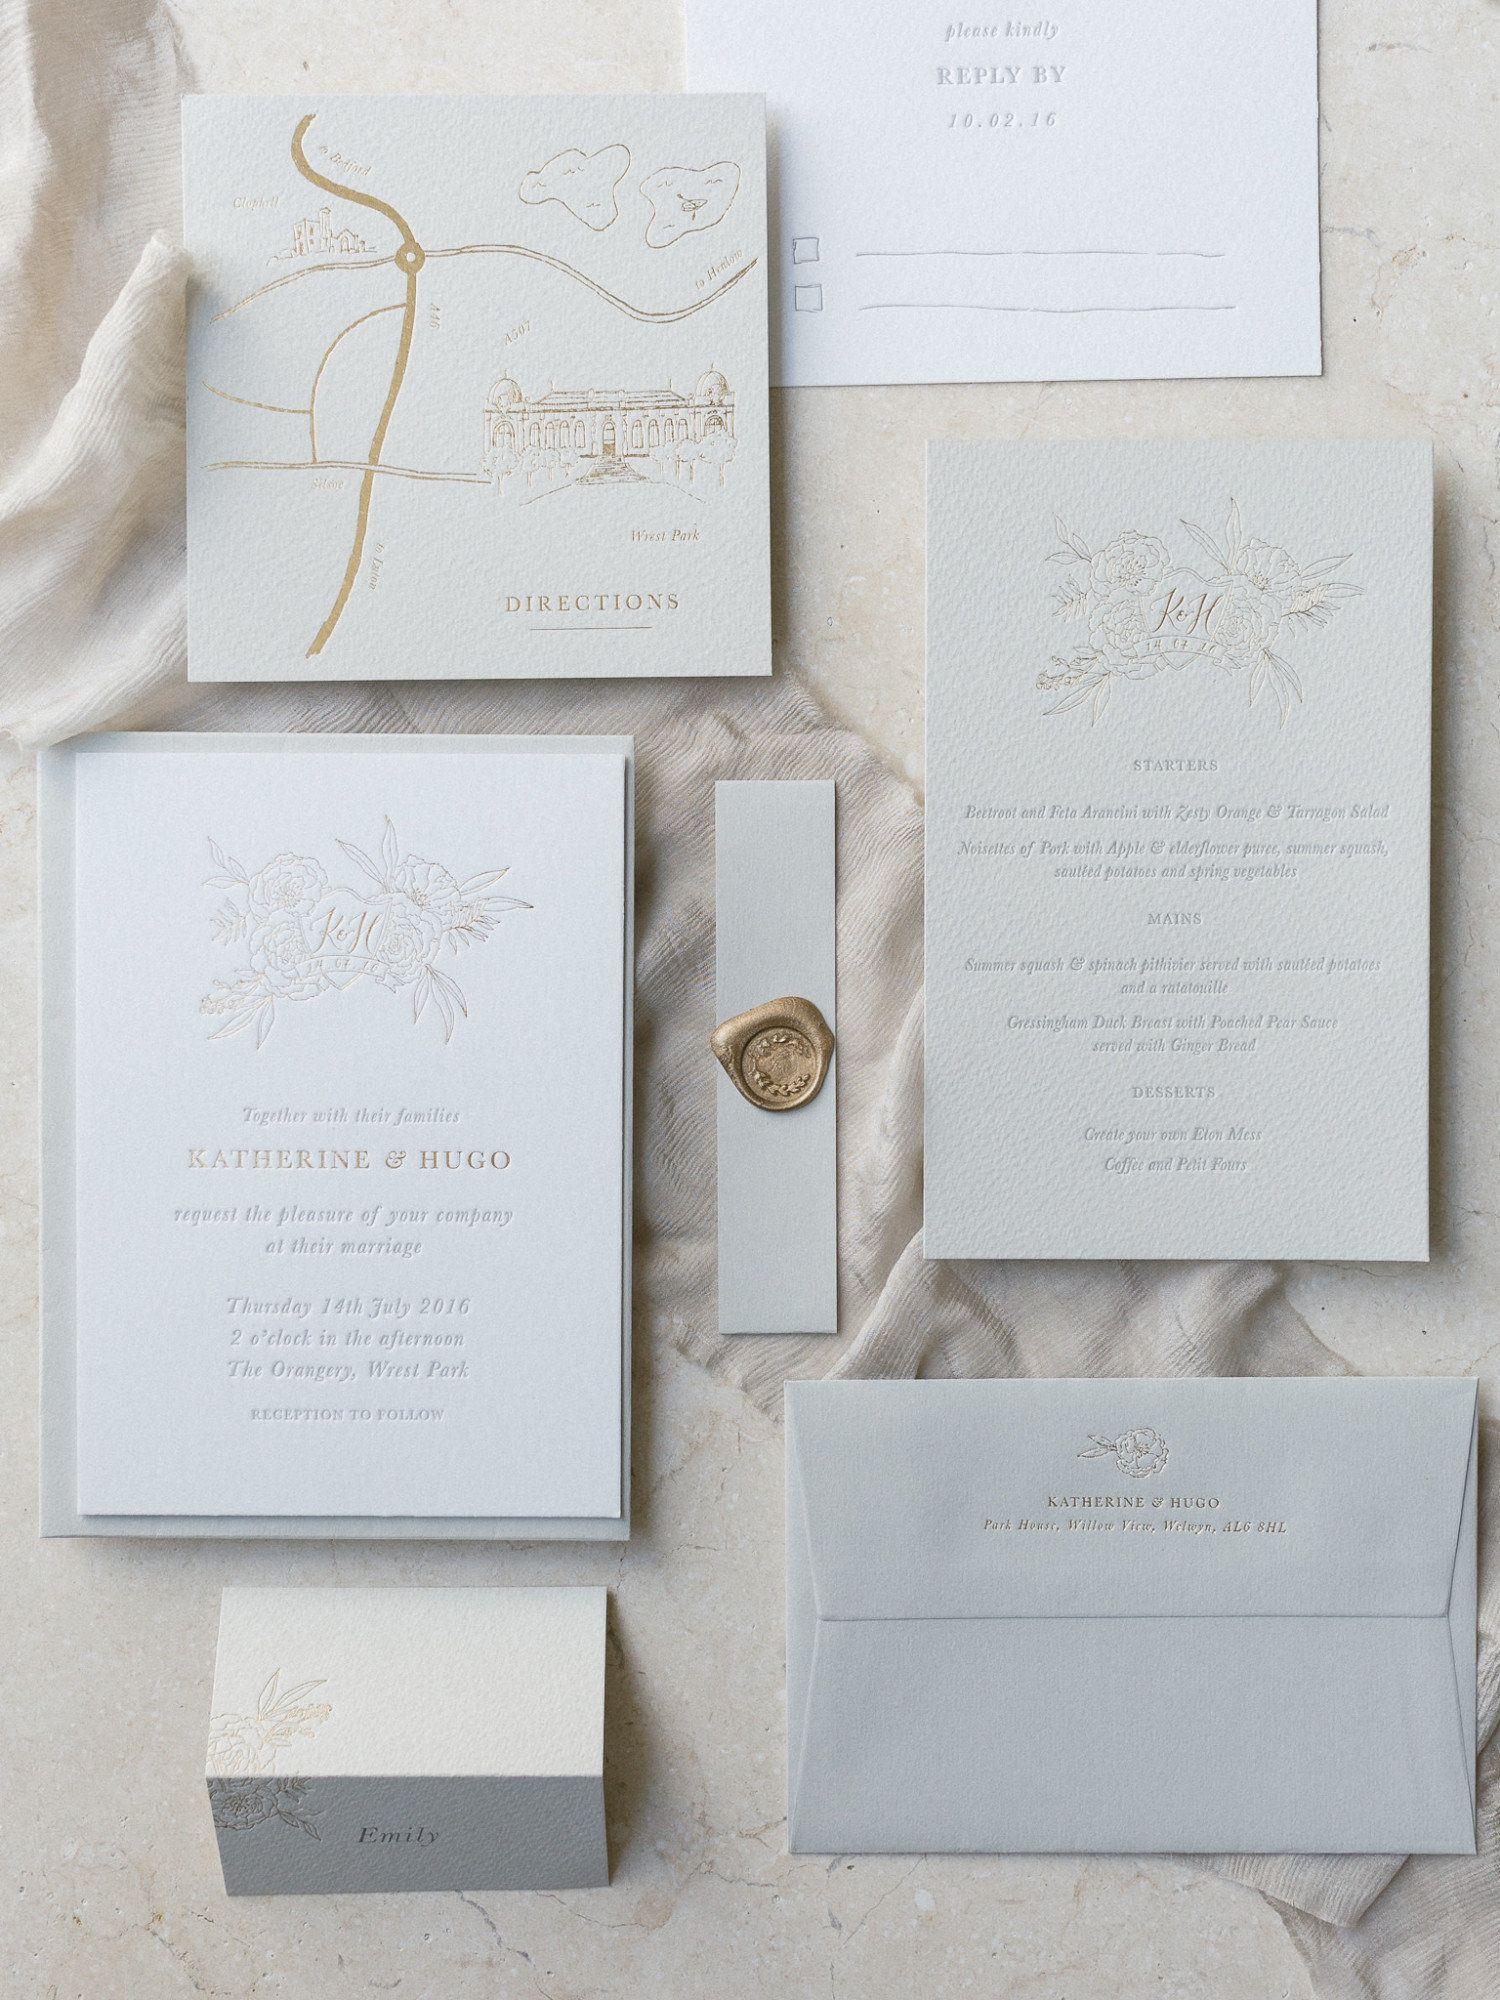 Letterpress wedding invitation stationery suite crest bespoke custom